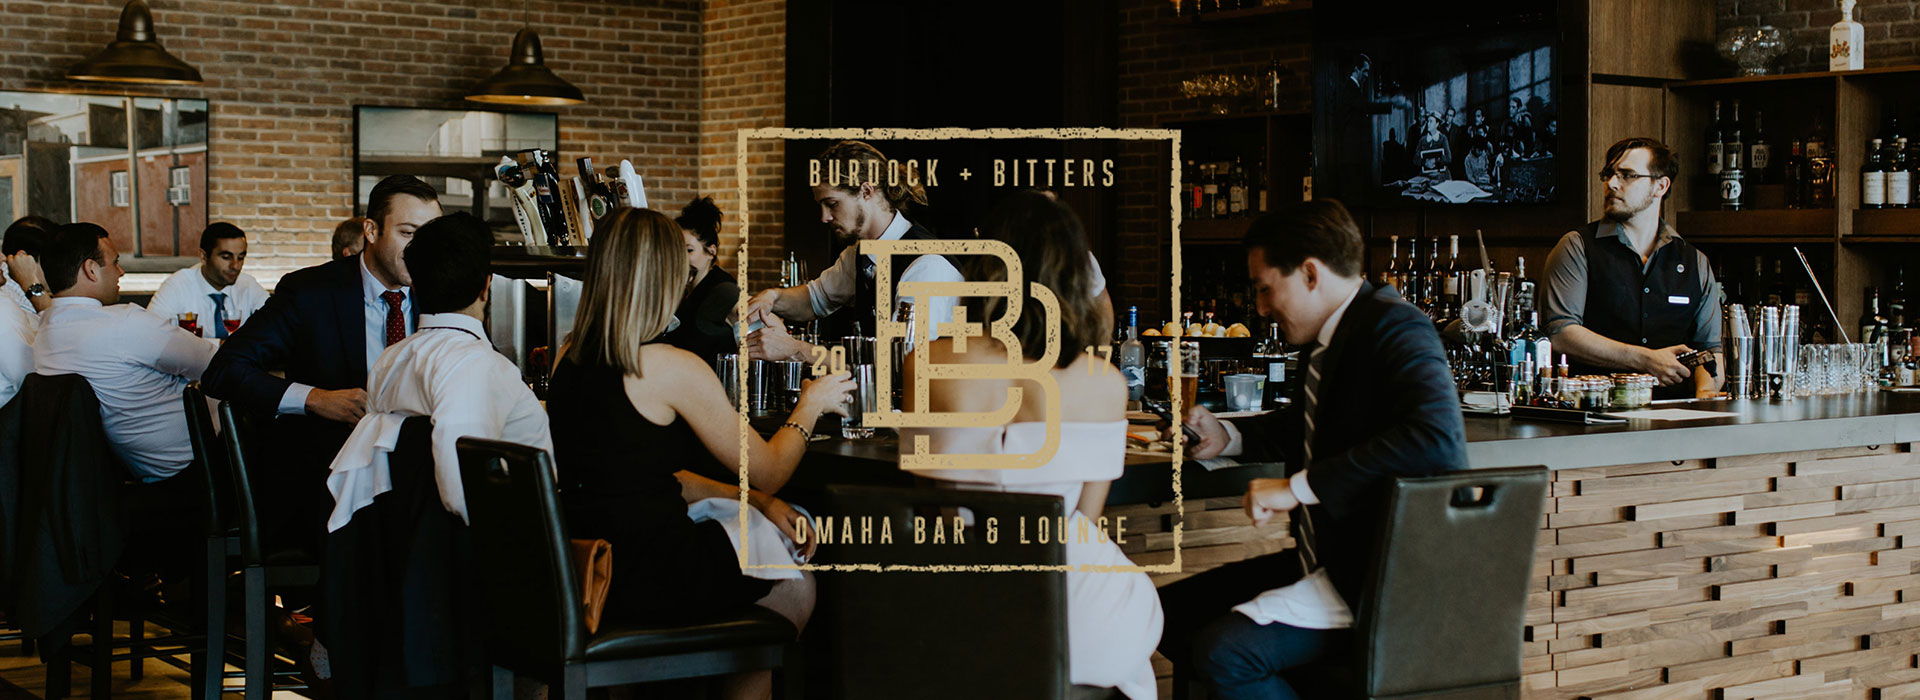 Burdock and Bitters Bar